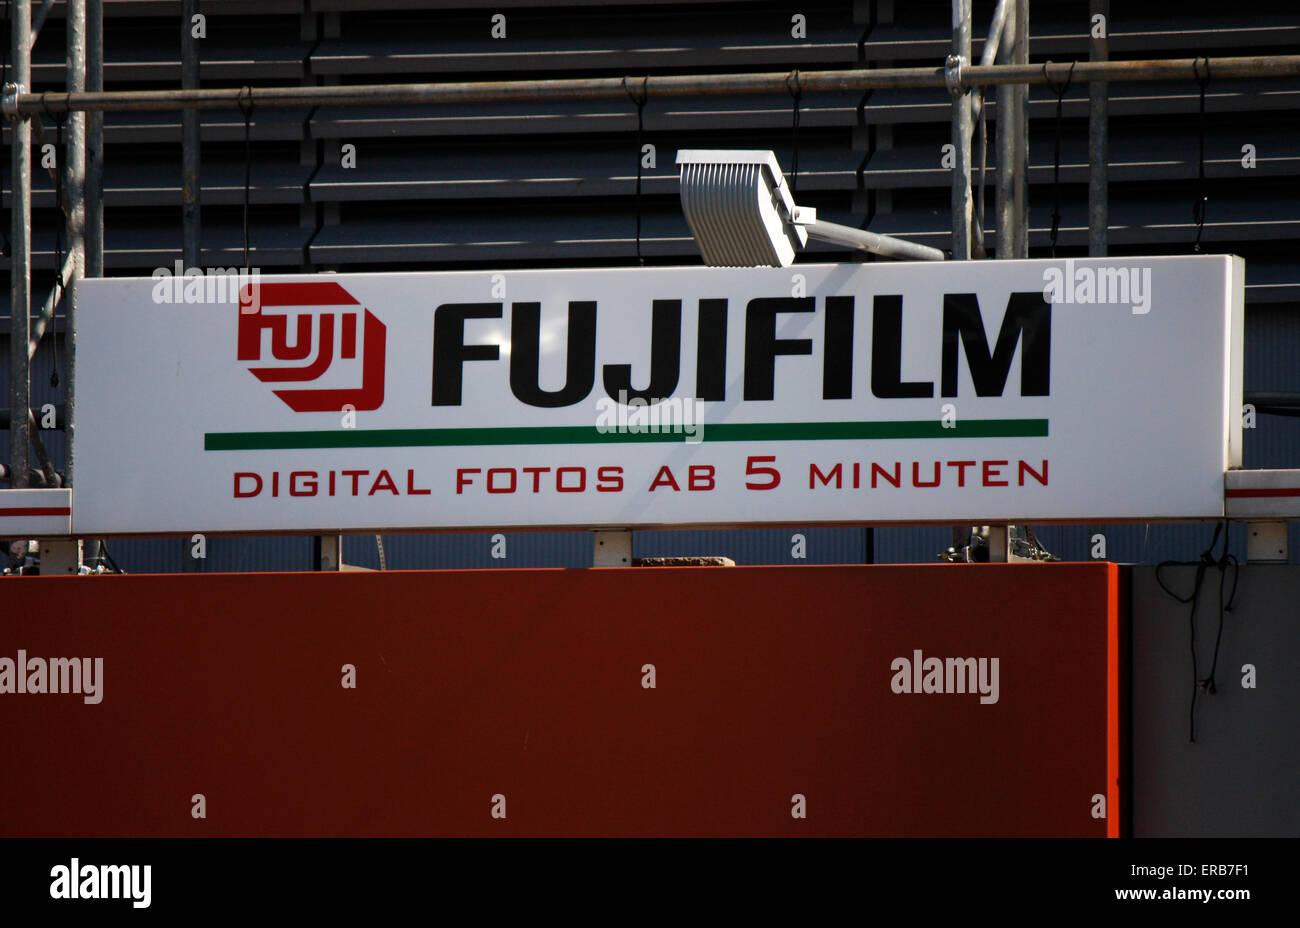 Marken: Fujifilm, Berlin-Mitte. - Stock Image